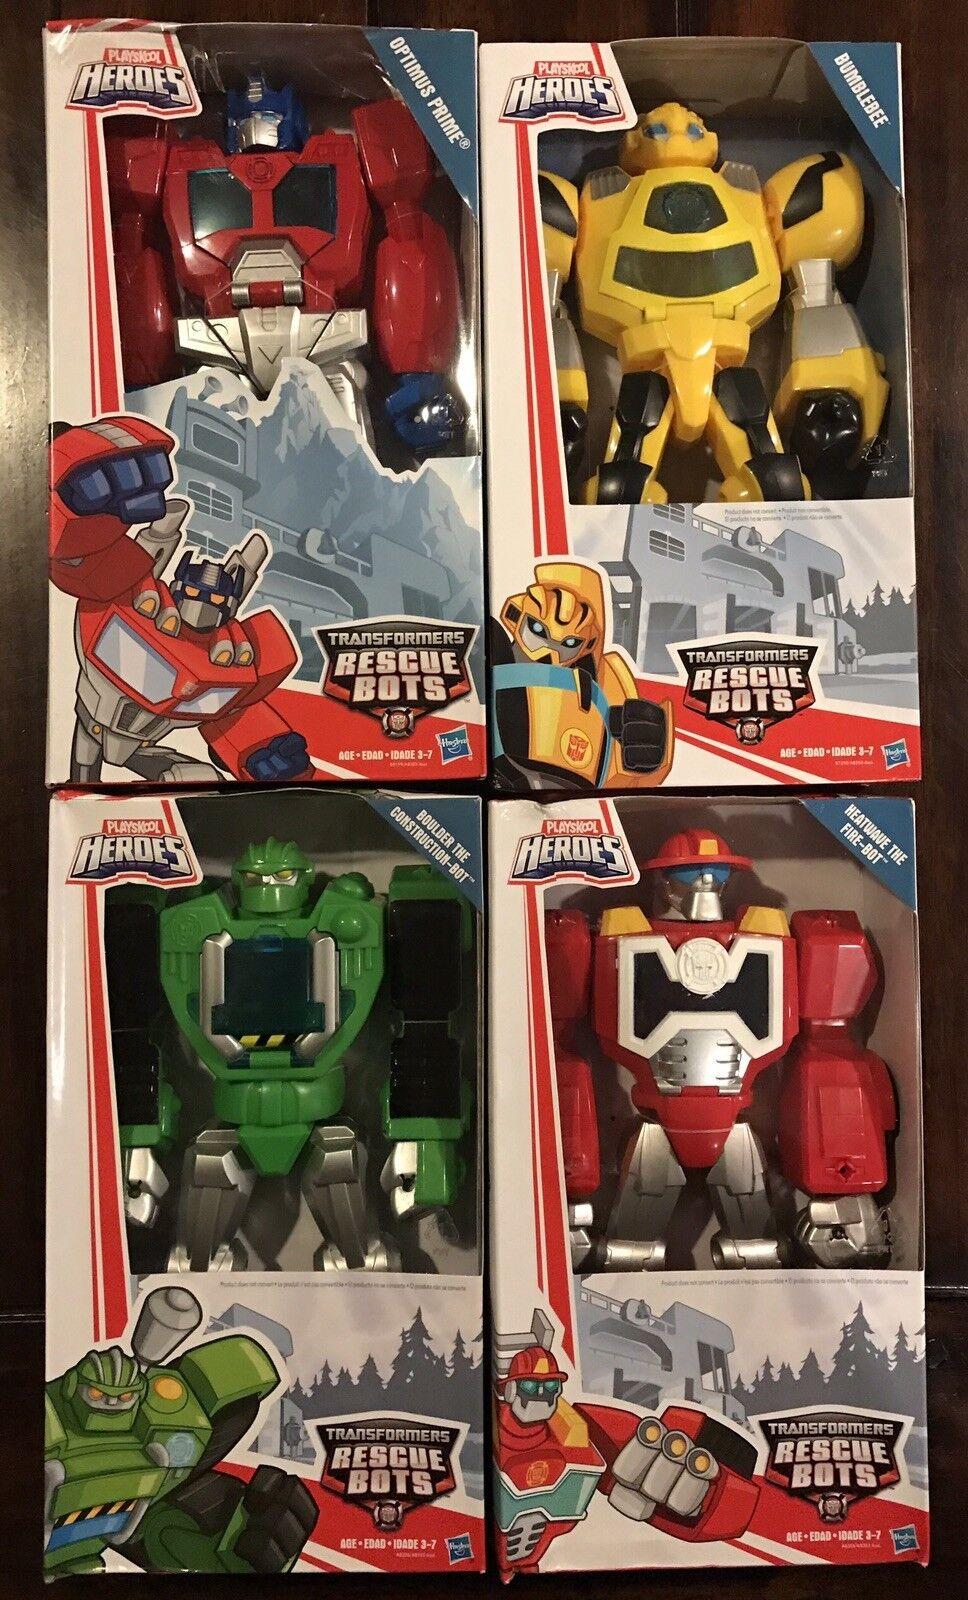 "Playskool 11"" Transformers Rescue Bots Optimus, Heatwave, Boulder, Bumblebee NIB"